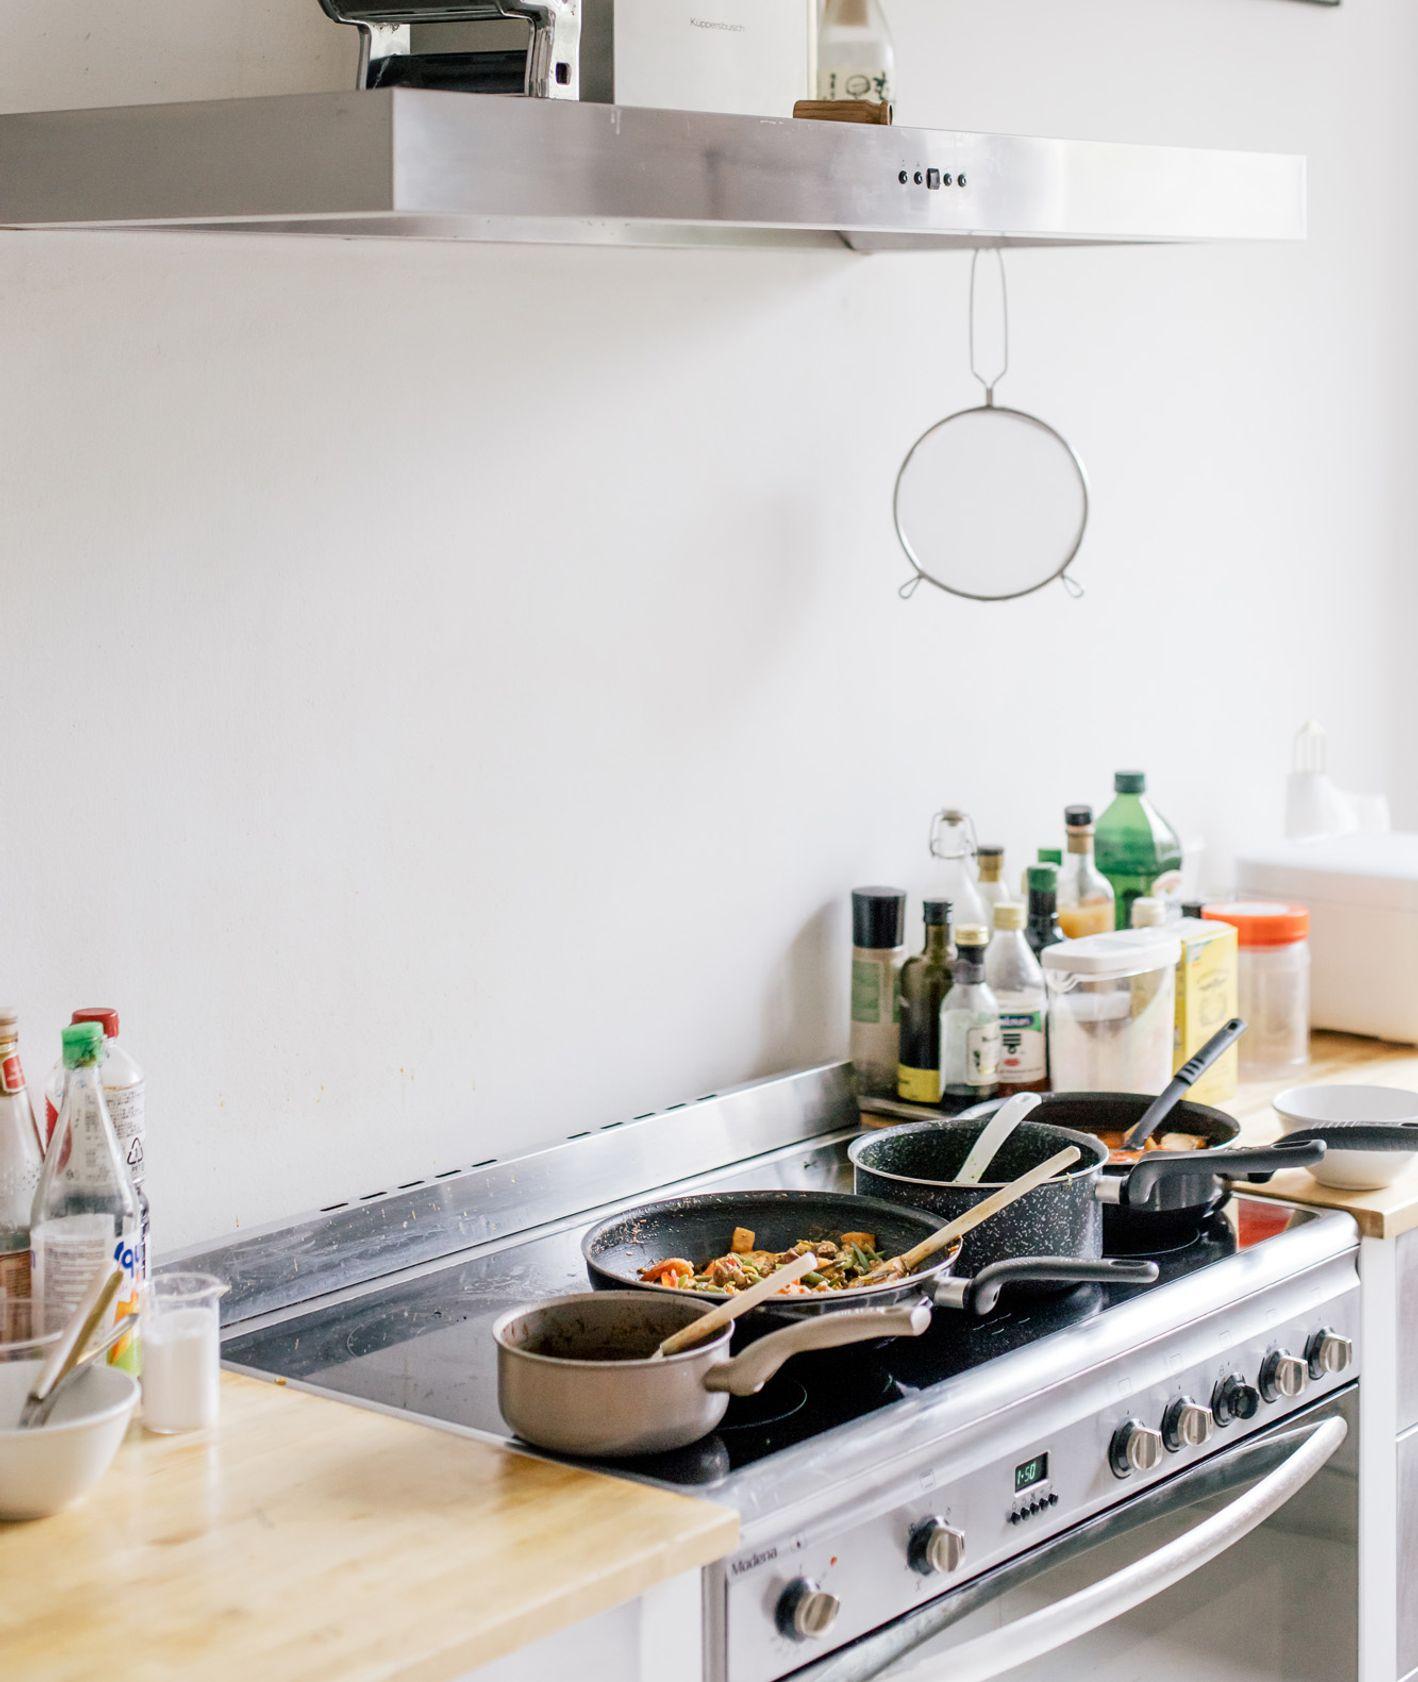 5 minut w kuchni